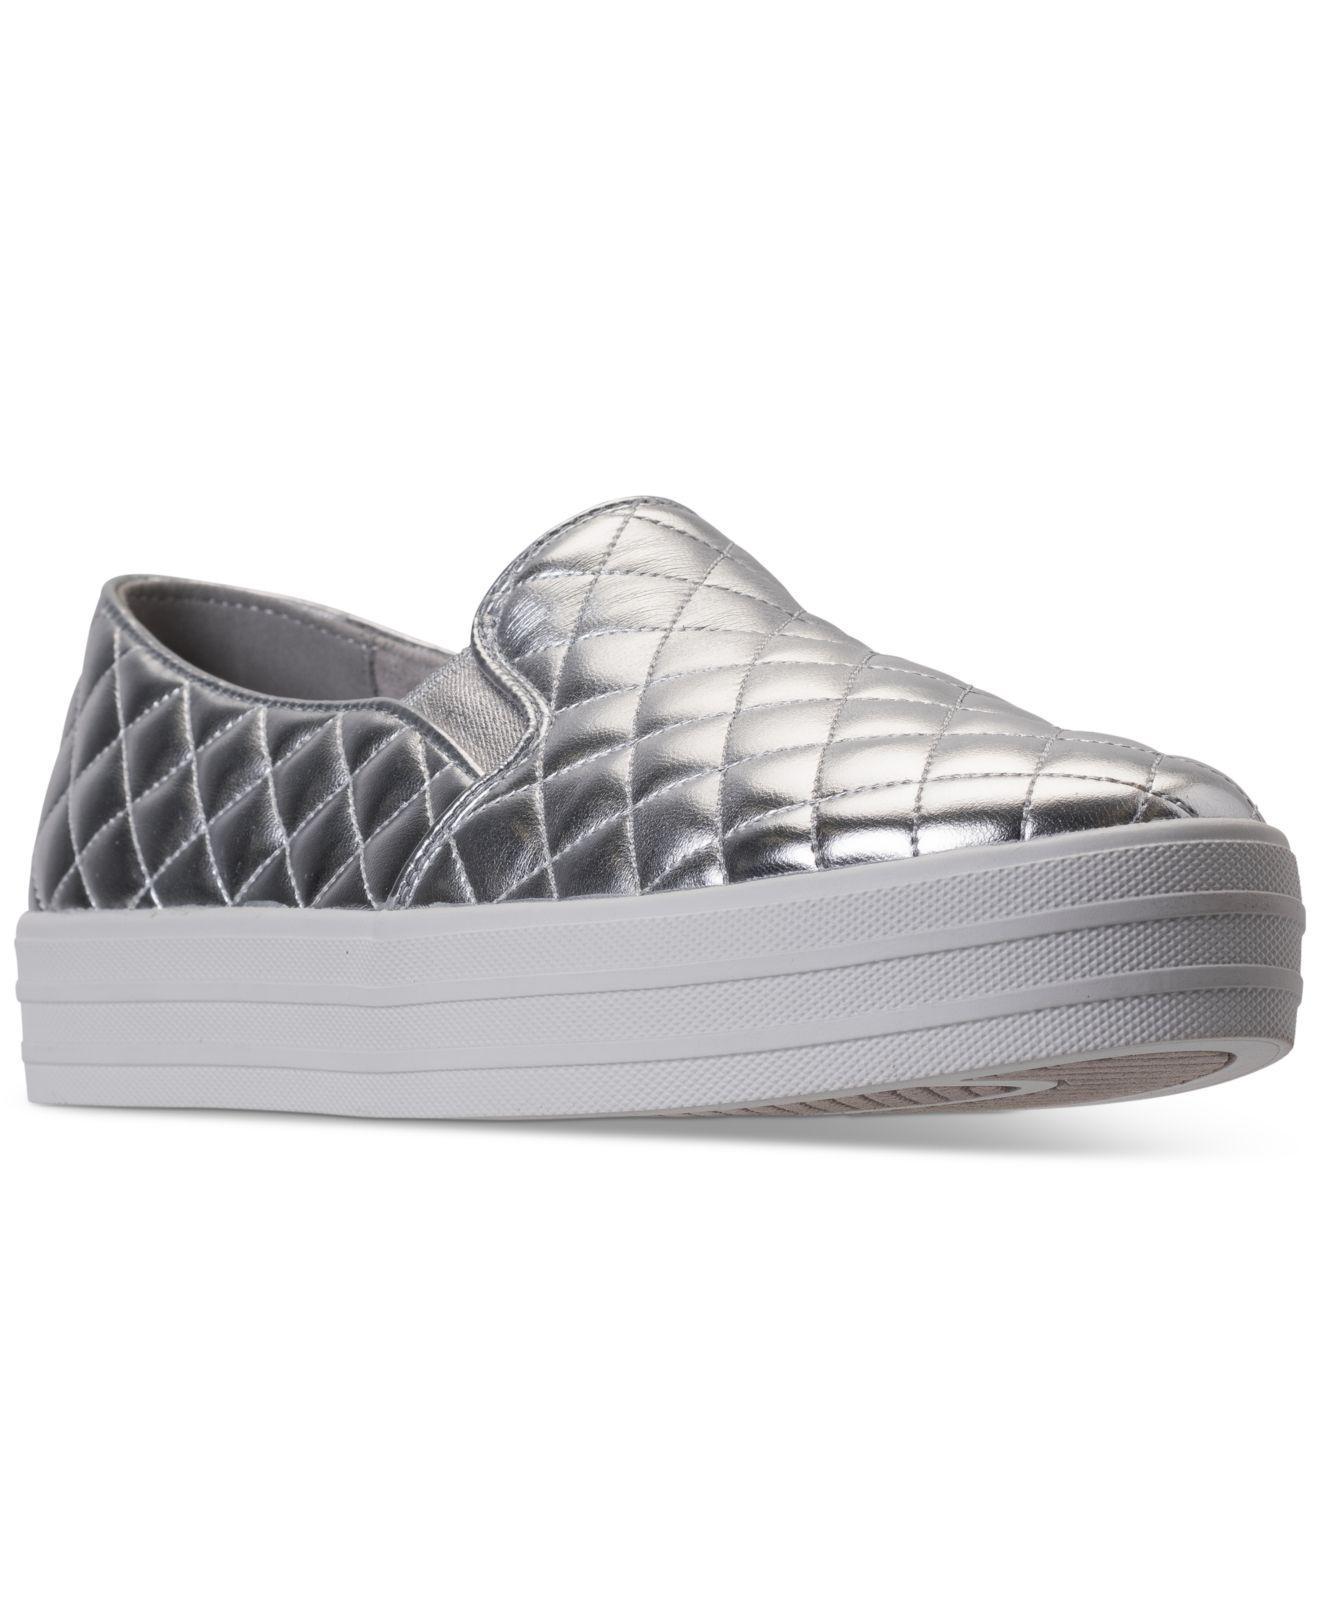 b3ff7c52ddb Lyst - Skechers Women s Double Up - Duvet Casual Sneakers From ...